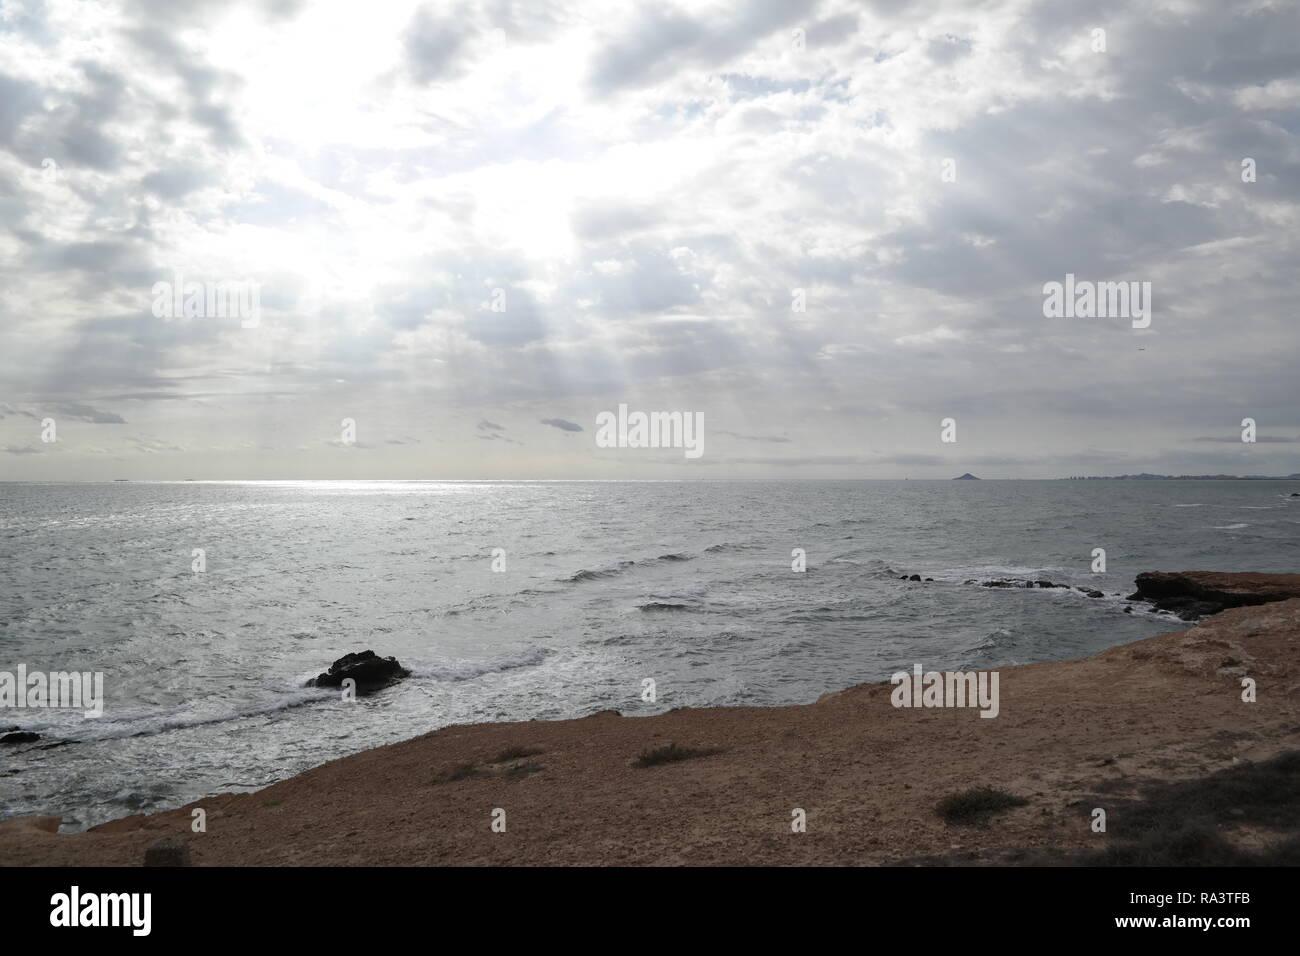 Sunbeams over the sea - Stock Image